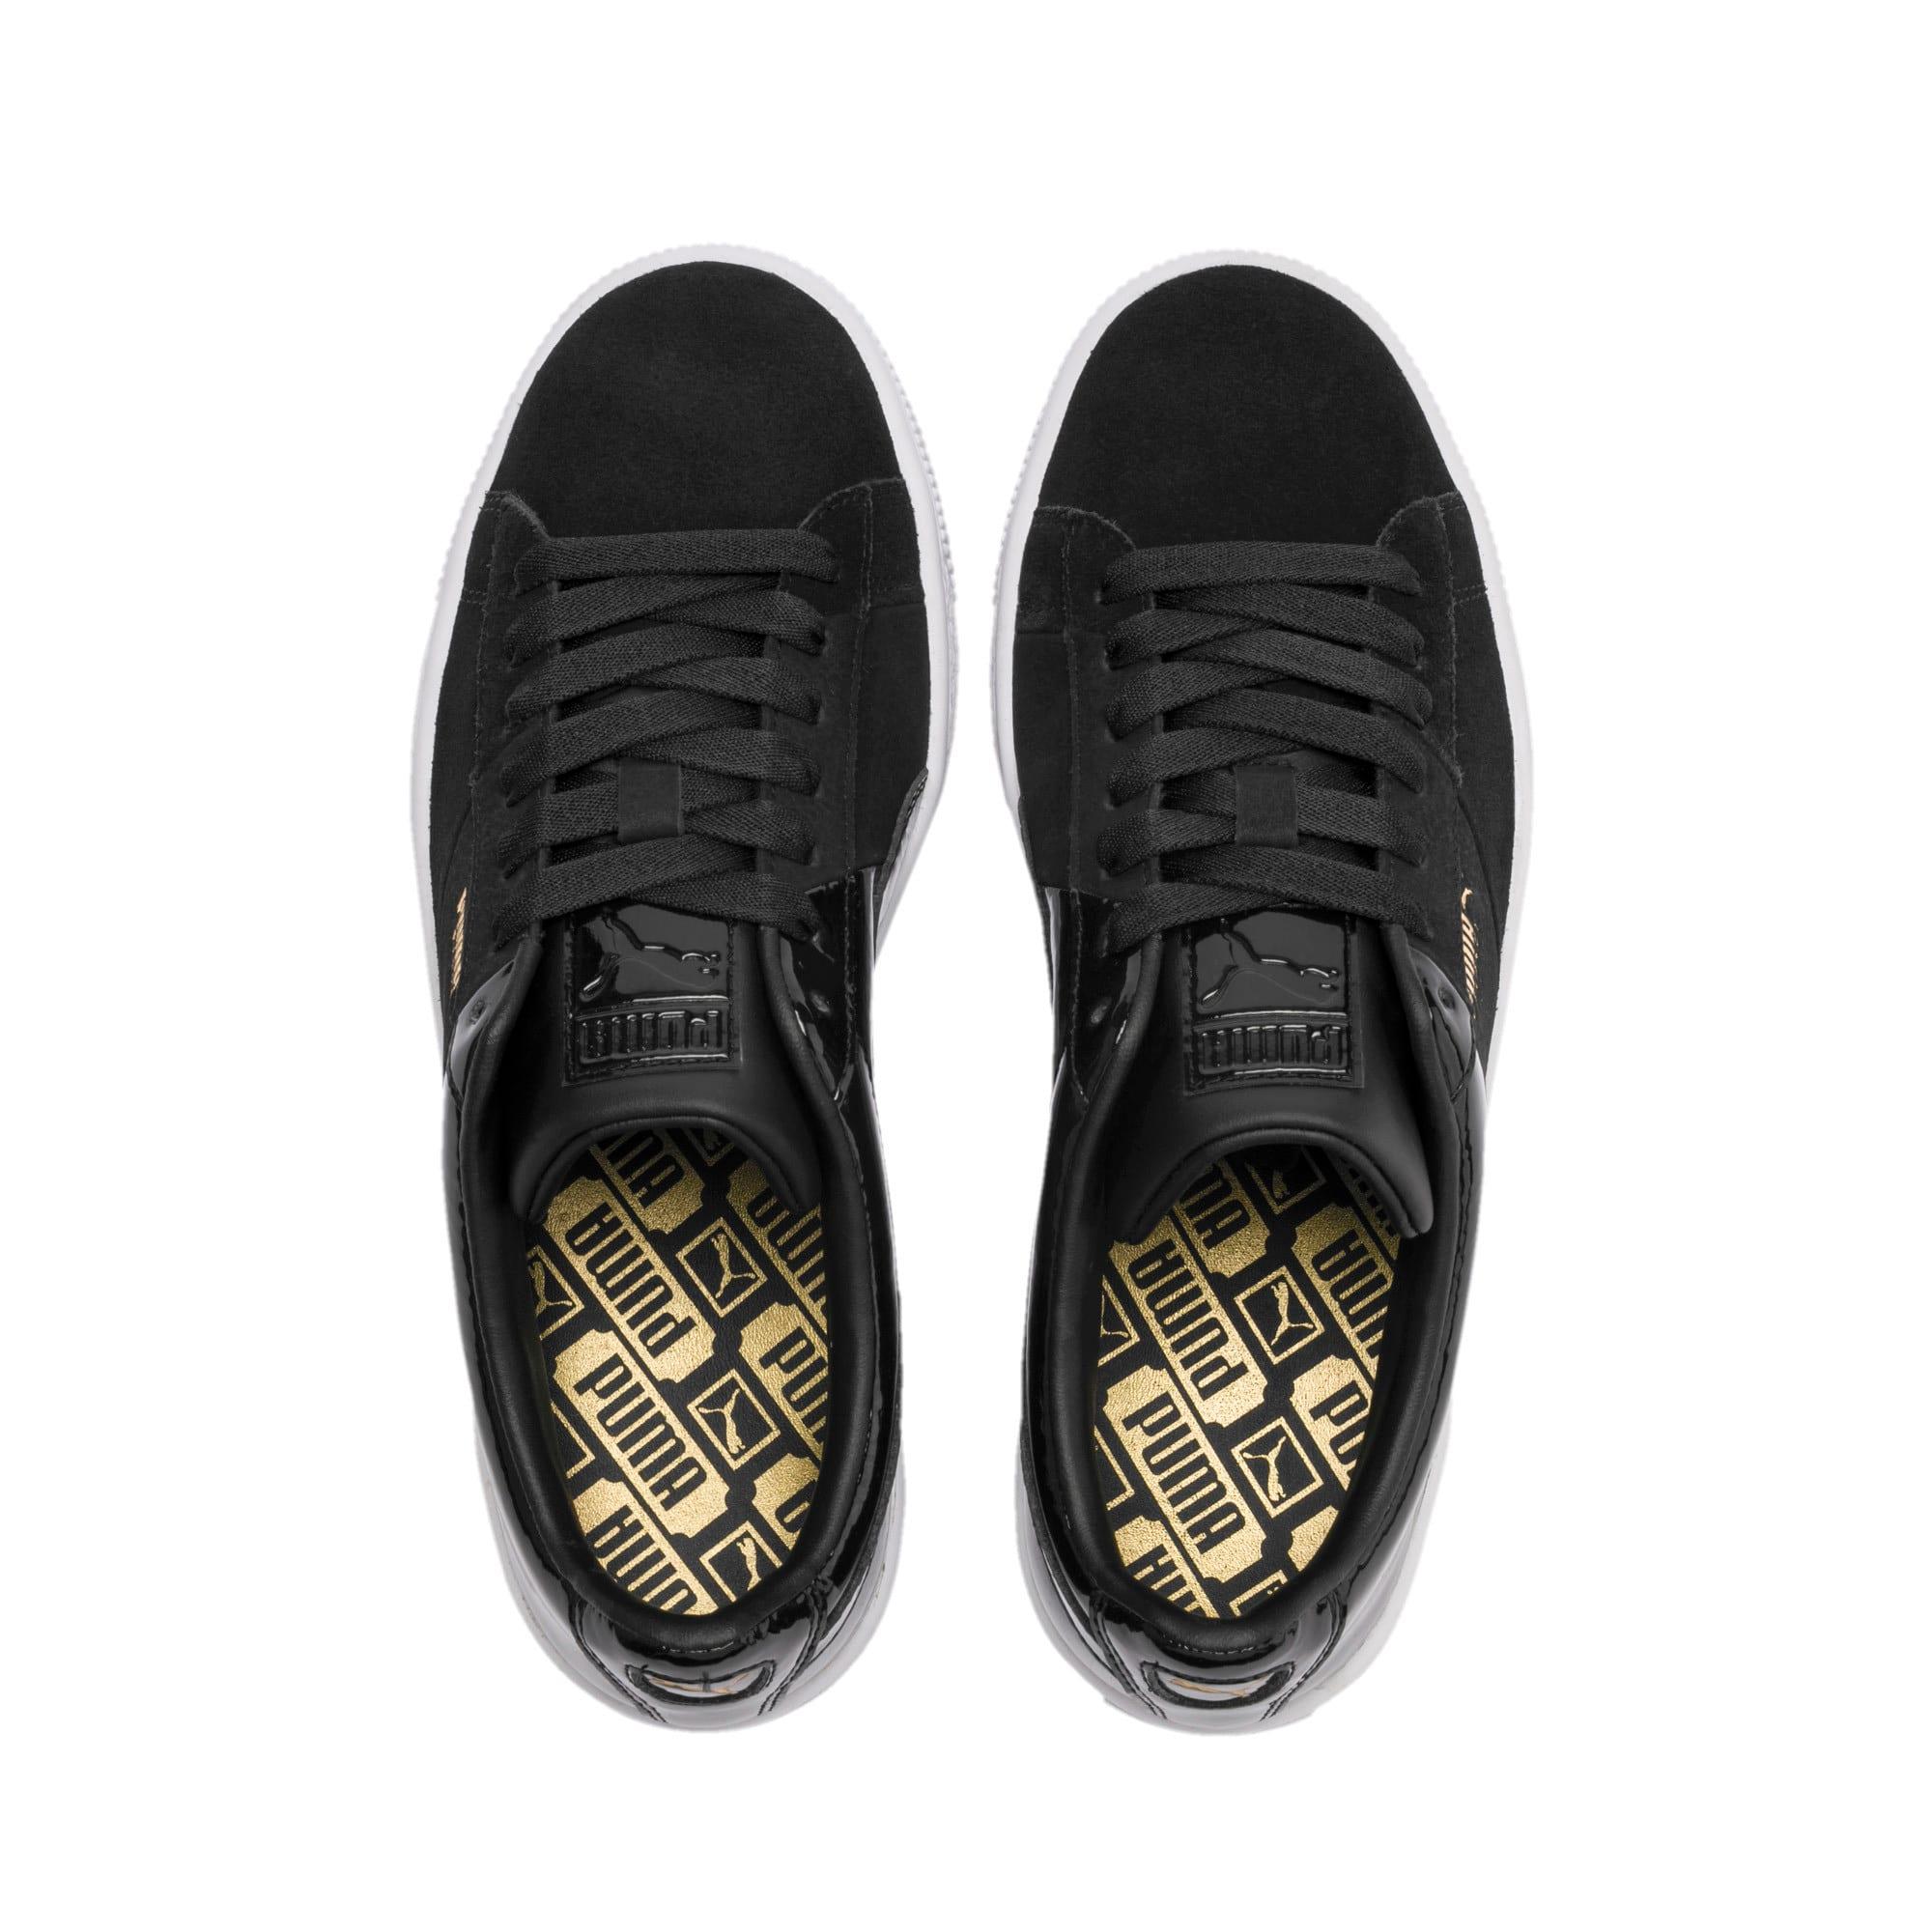 Thumbnail 7 of Basket Remix Women's Sneakers, Puma Black-Puma Team Gold, medium